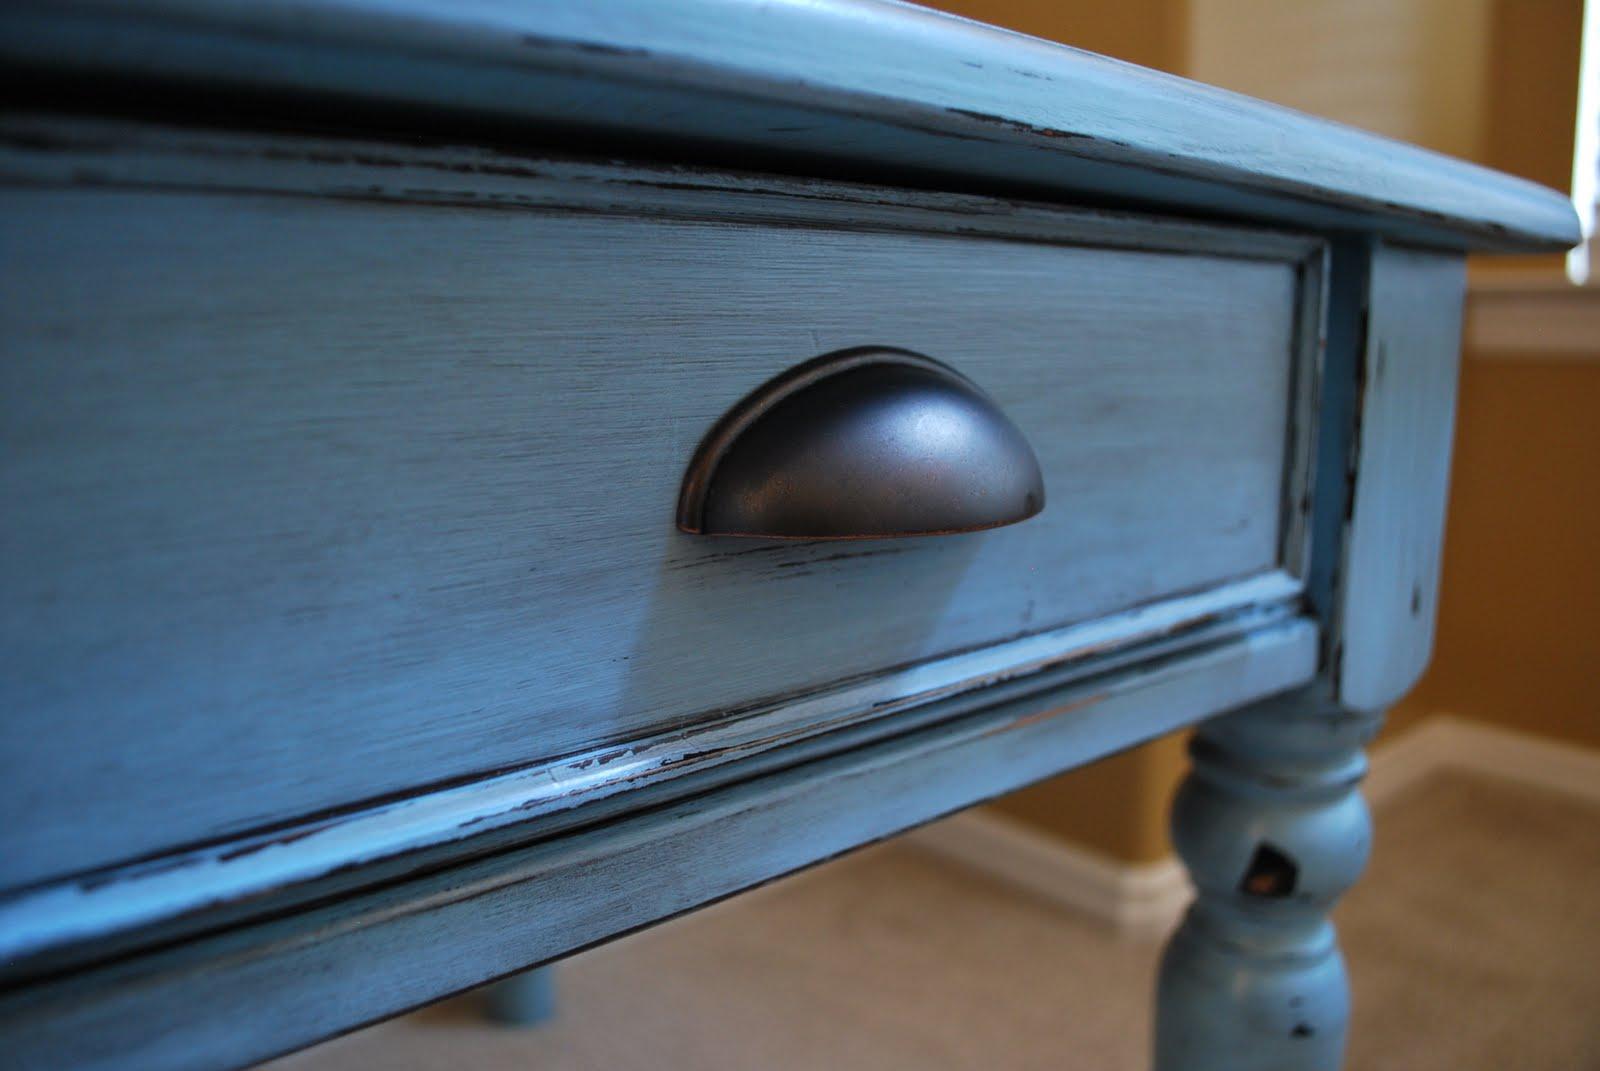 Brand-new B's Refurnishings: Robin Egg Blue, Distressed Side Tables LD53